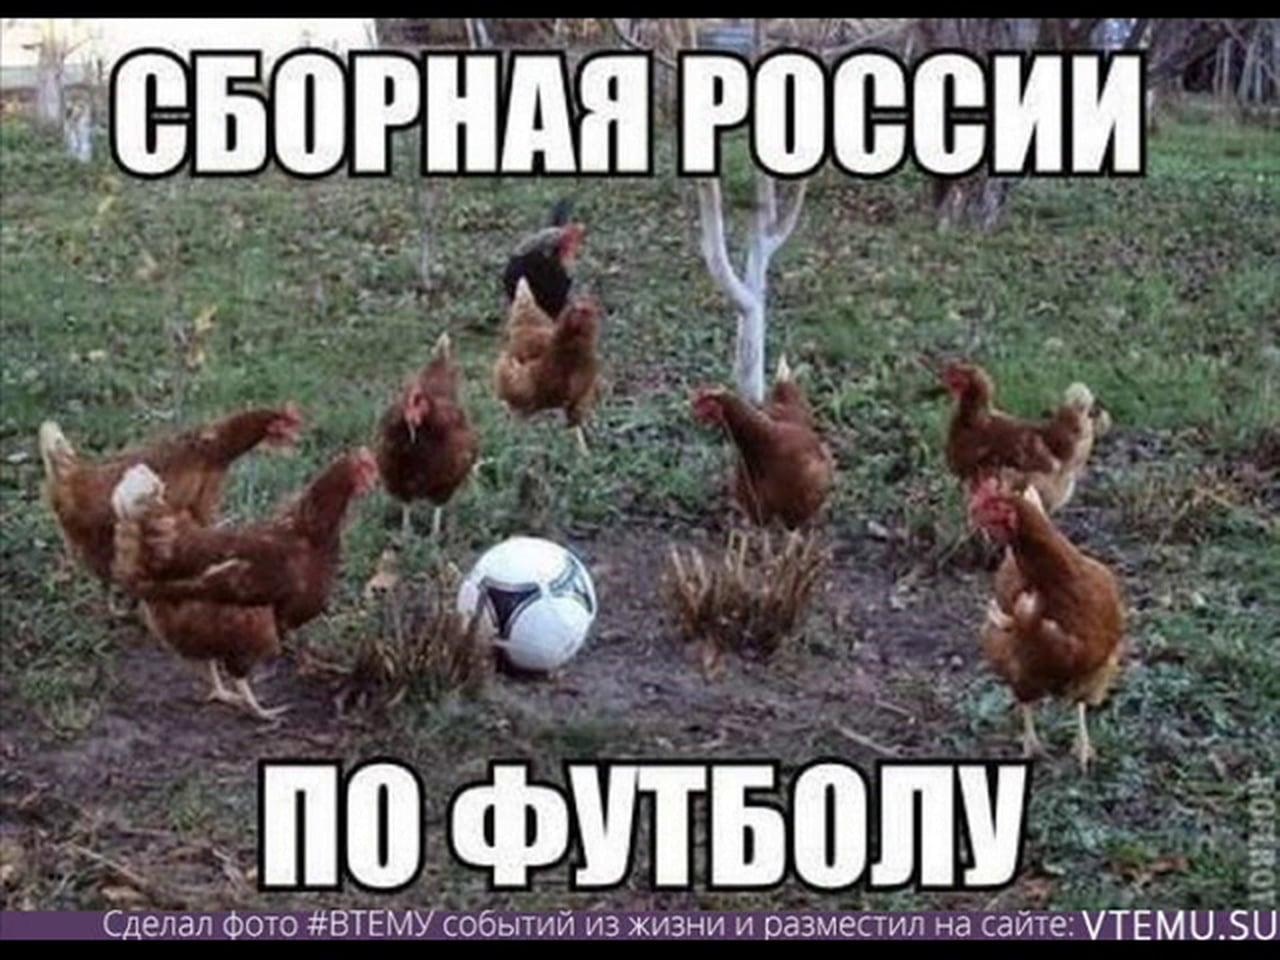 Фото прикол про сборную россии по футболу 3